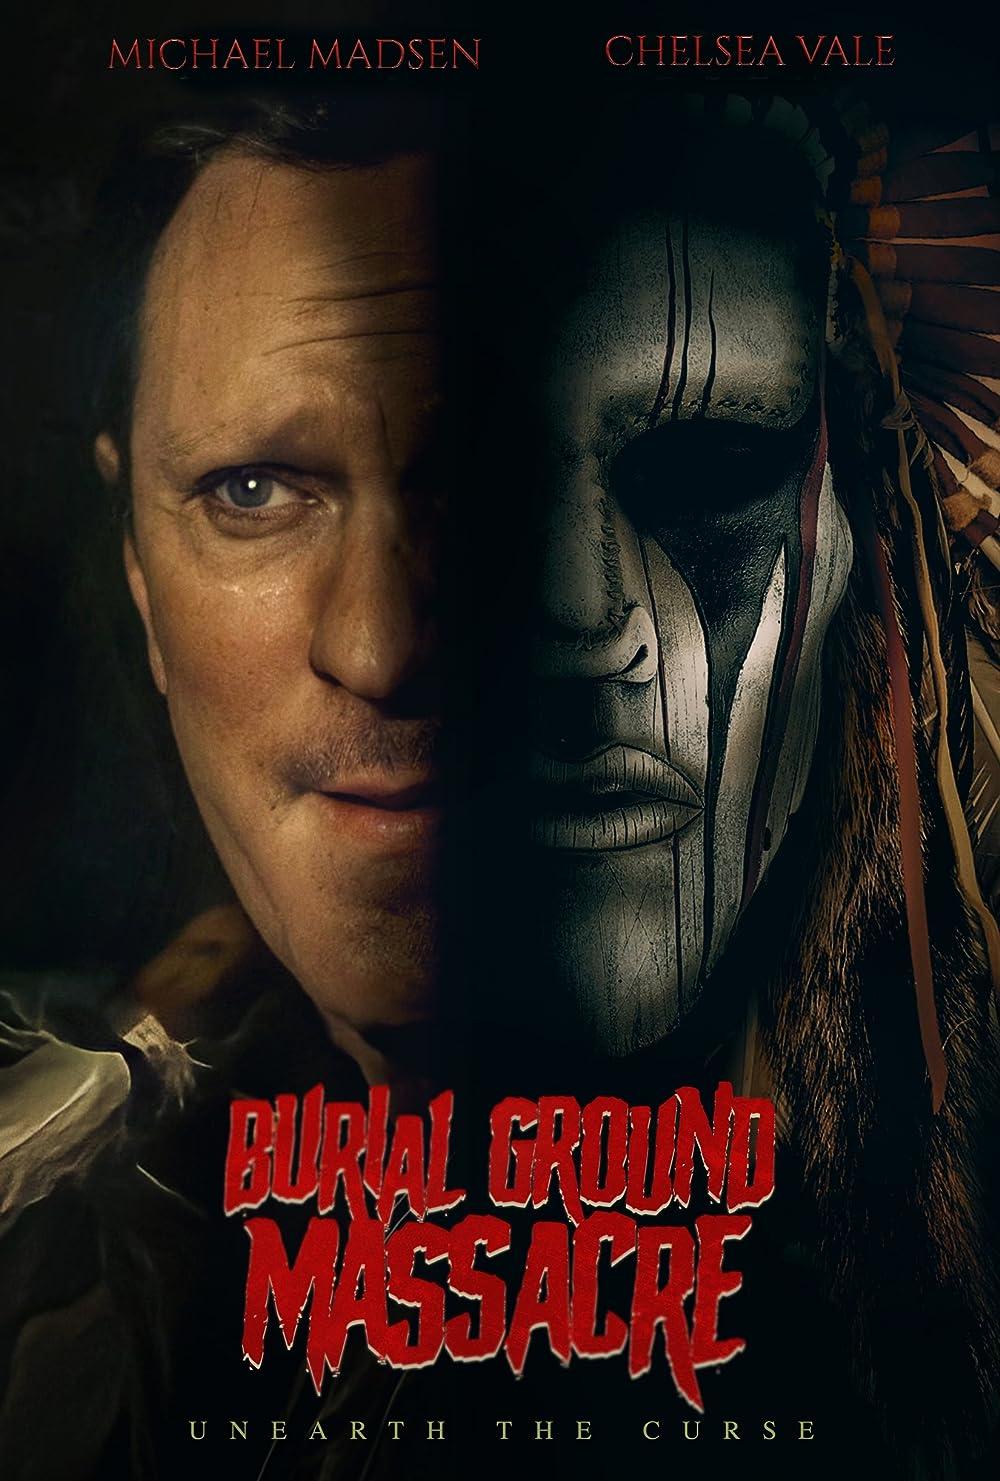 Download Burial Ground Massacre (2021) Bengali Dubbed (Voice Over) WEBRip 720p [Full Movie] 1XBET FREE on 1XCinema.com & KatMovieHD.sk